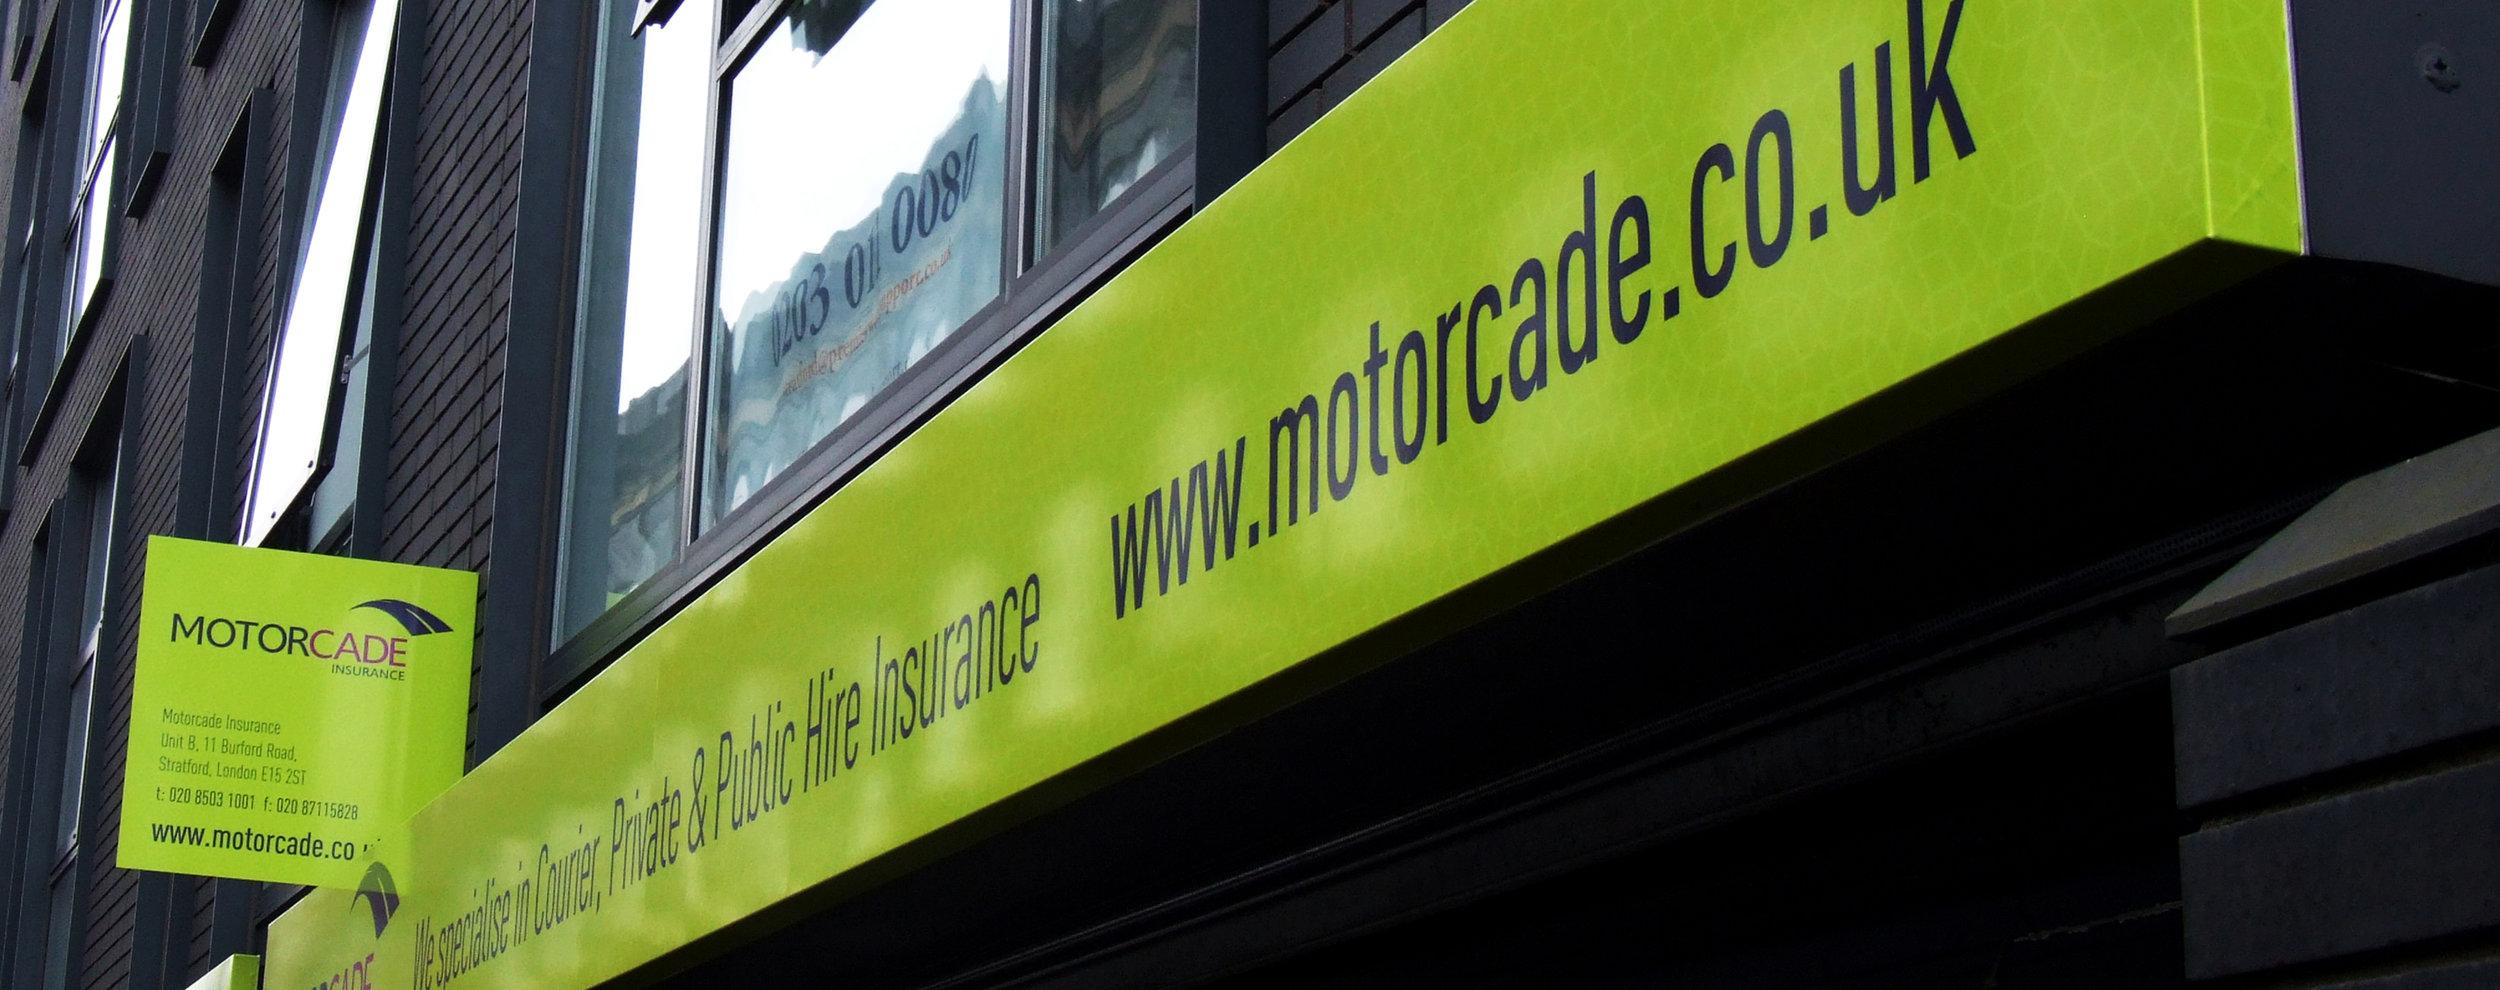 Motorcade frontage.jpg